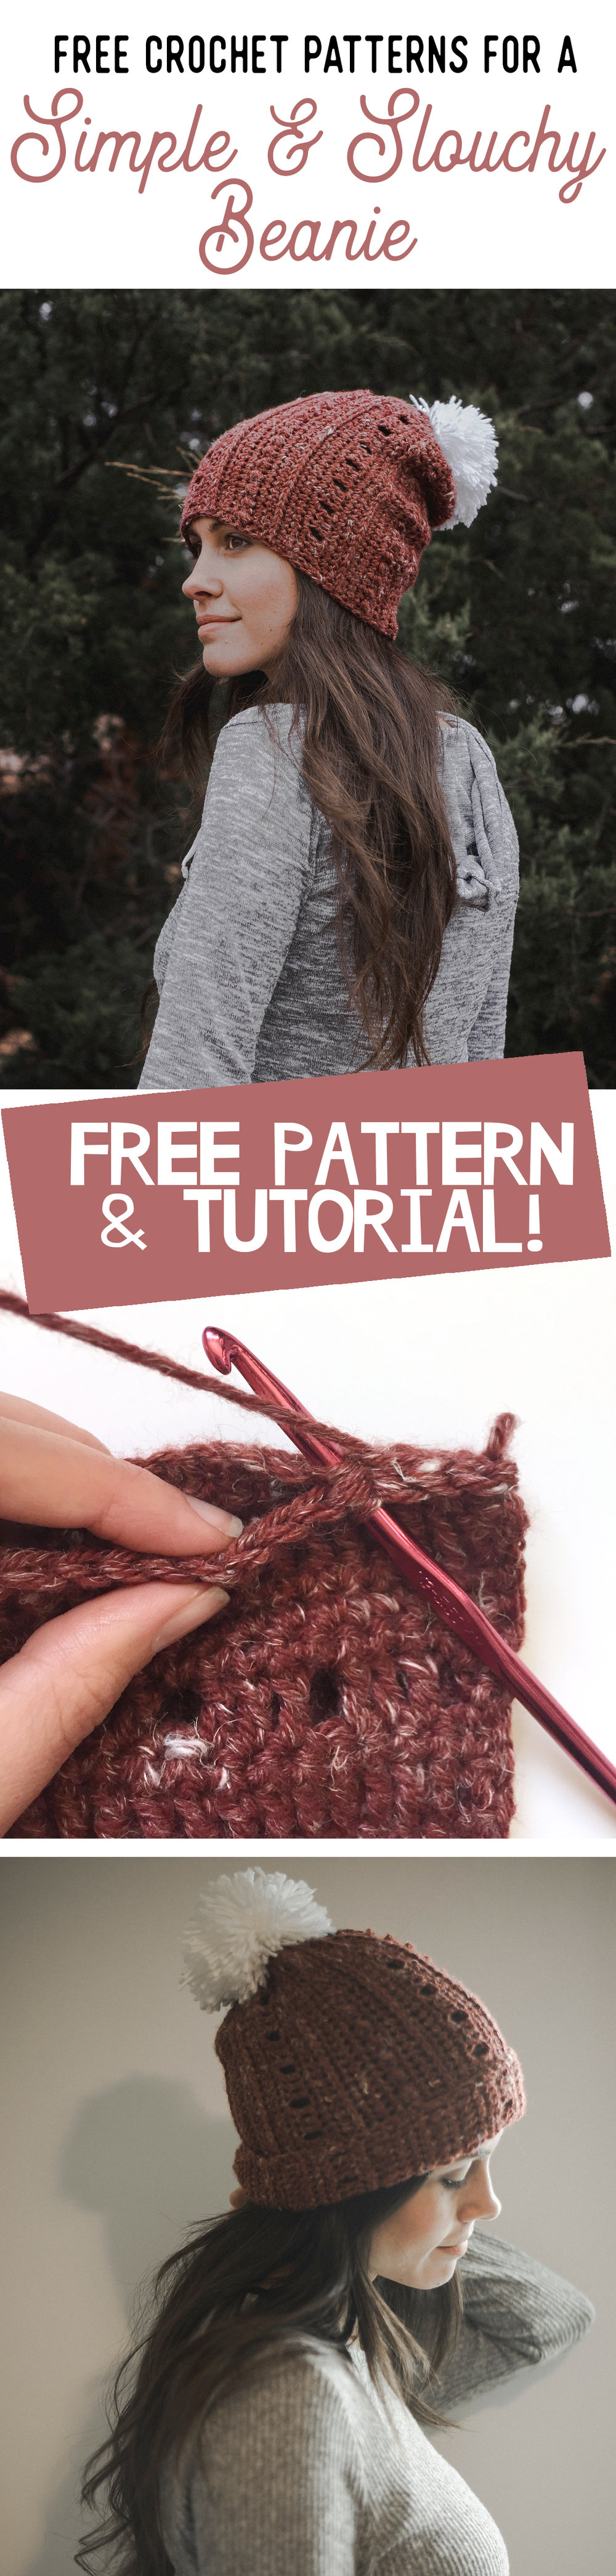 Free Crochet Pattern for a Super Simple   Slouchy Beanie — Megmade ... 6bd9551dada